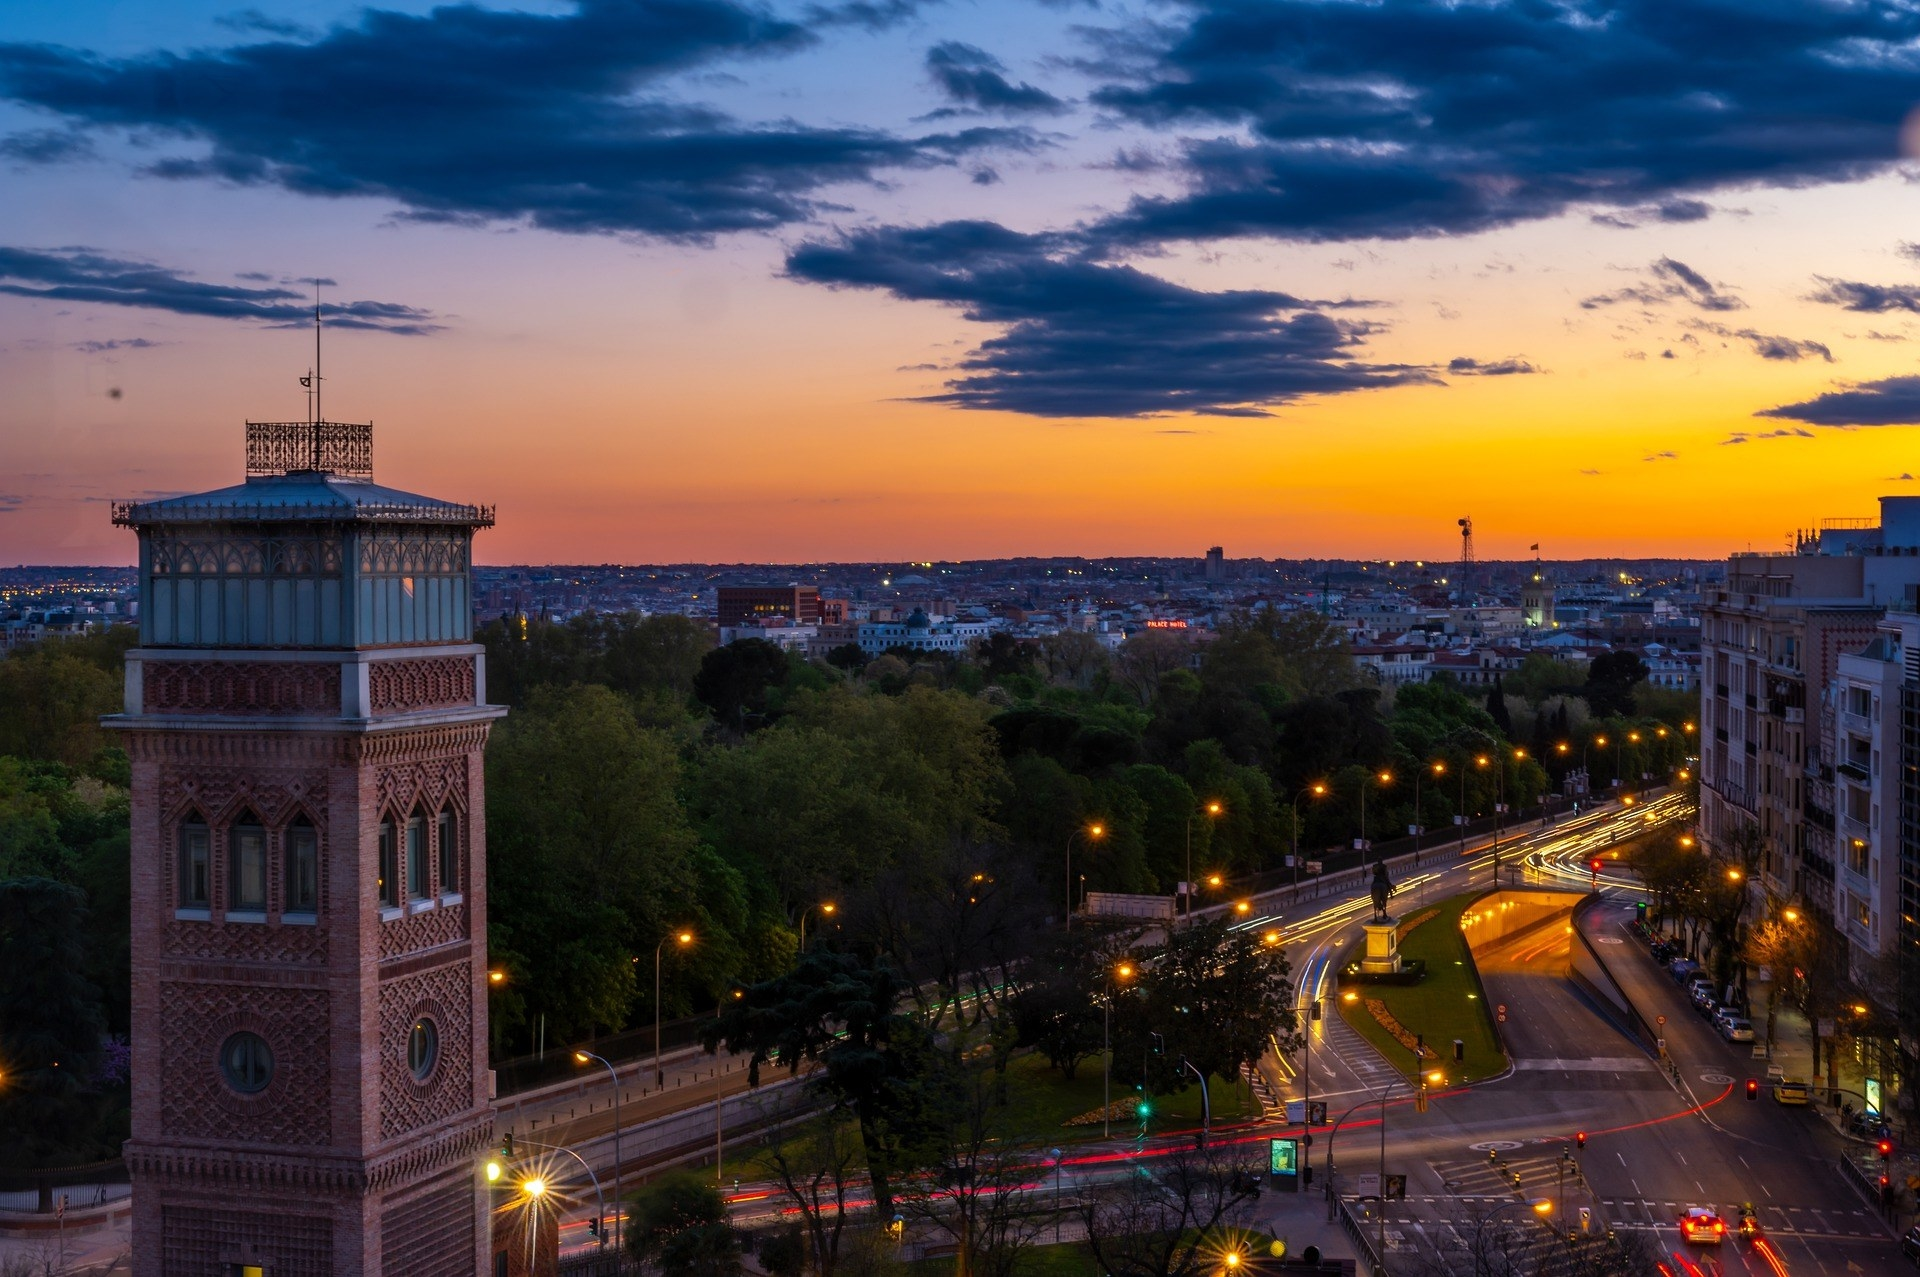 Night view of Madrid in Spain.